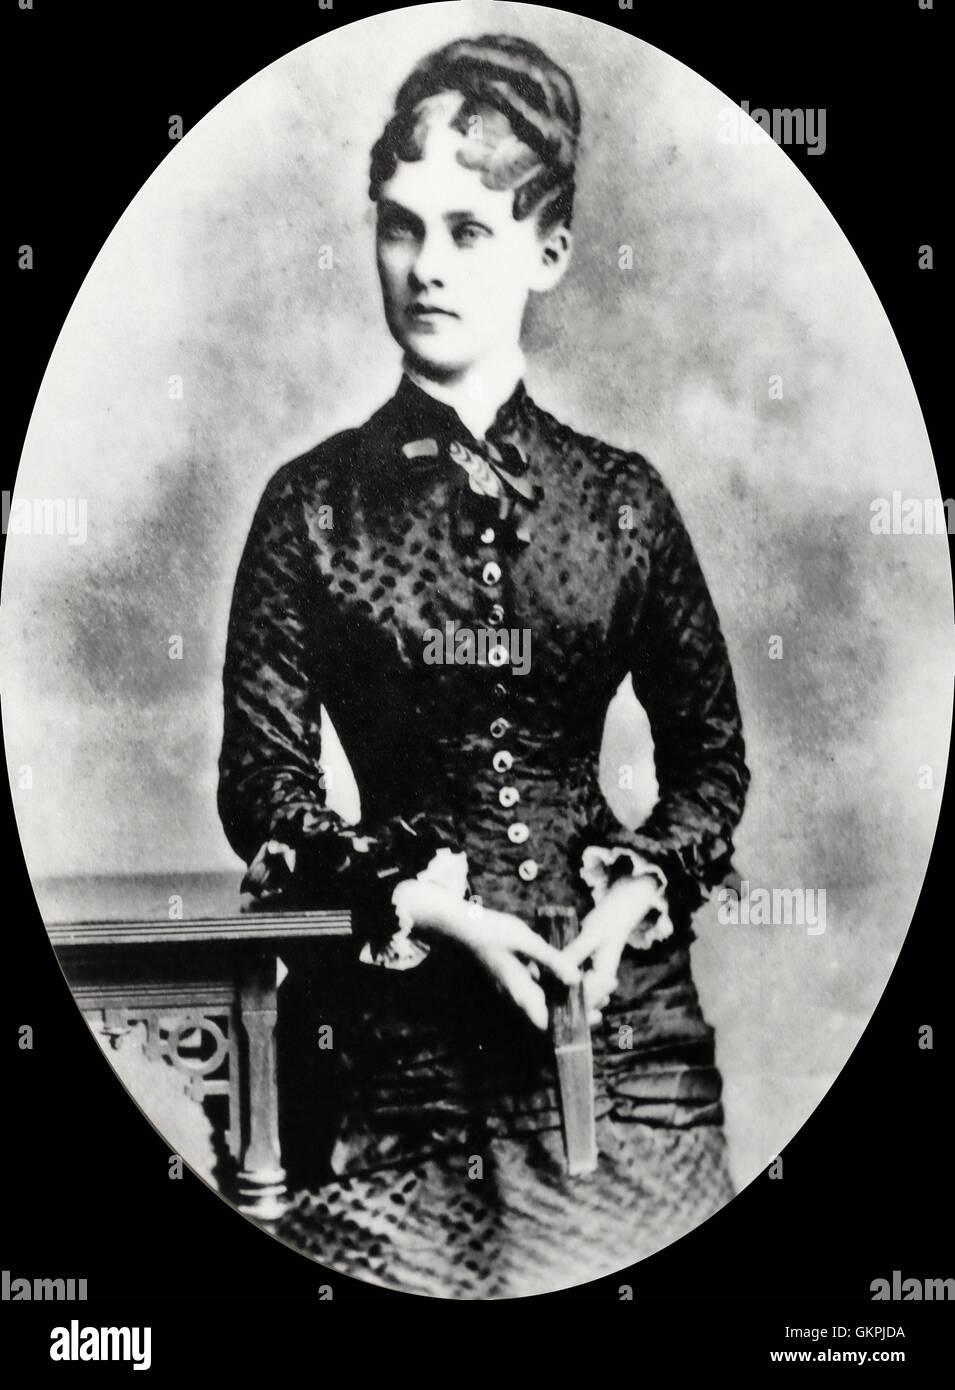 Alice lee roosevelt pictures TR Center - Alice Hathaway Lee Roosevelt